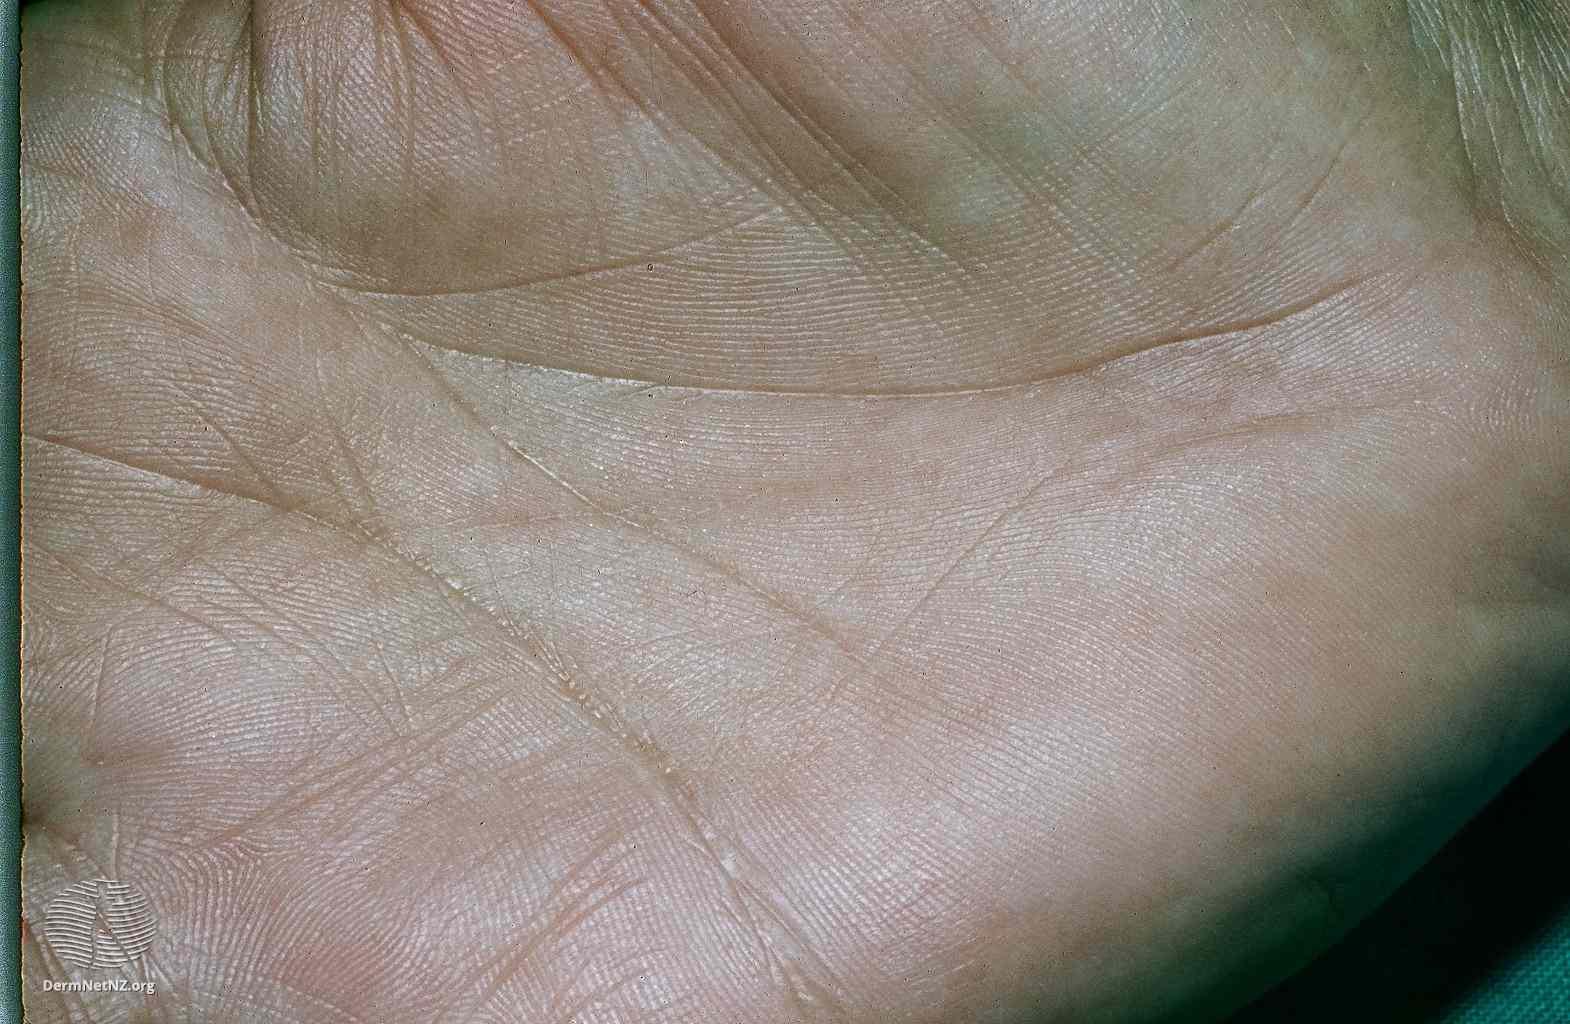 Palmar crease pigmentation in Addison disease